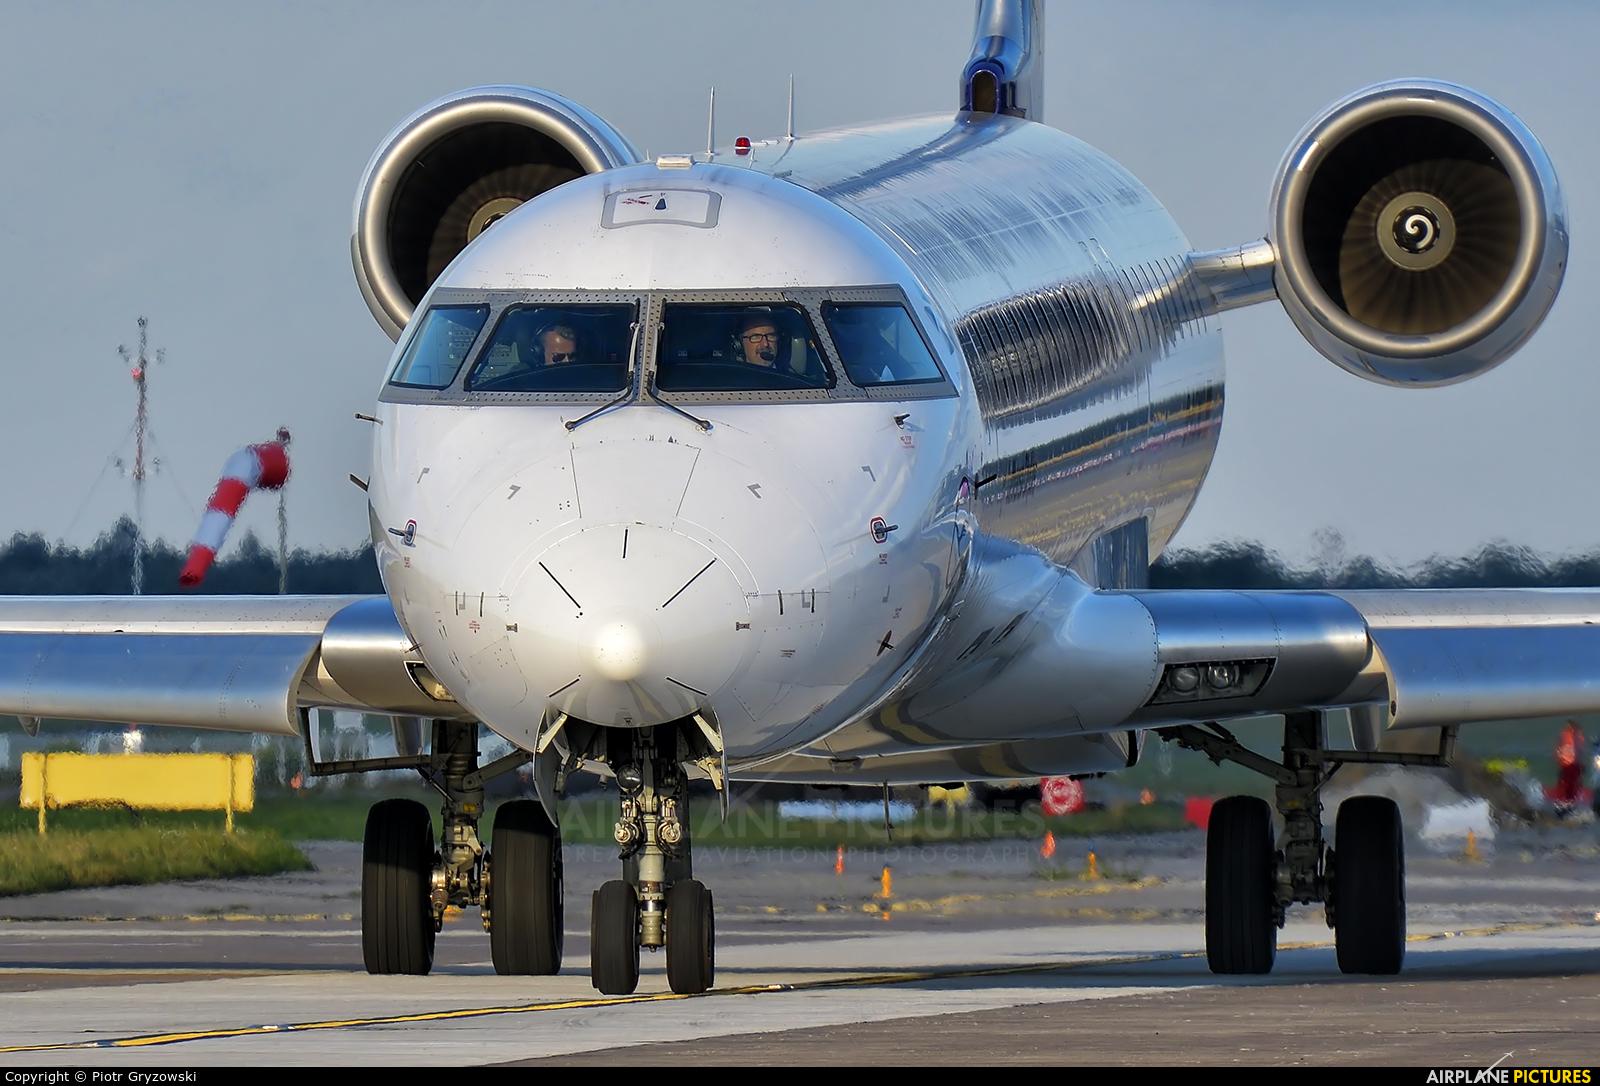 Lufthansa Regional - CityLine D-ACNO aircraft at Katowice - Pyrzowice